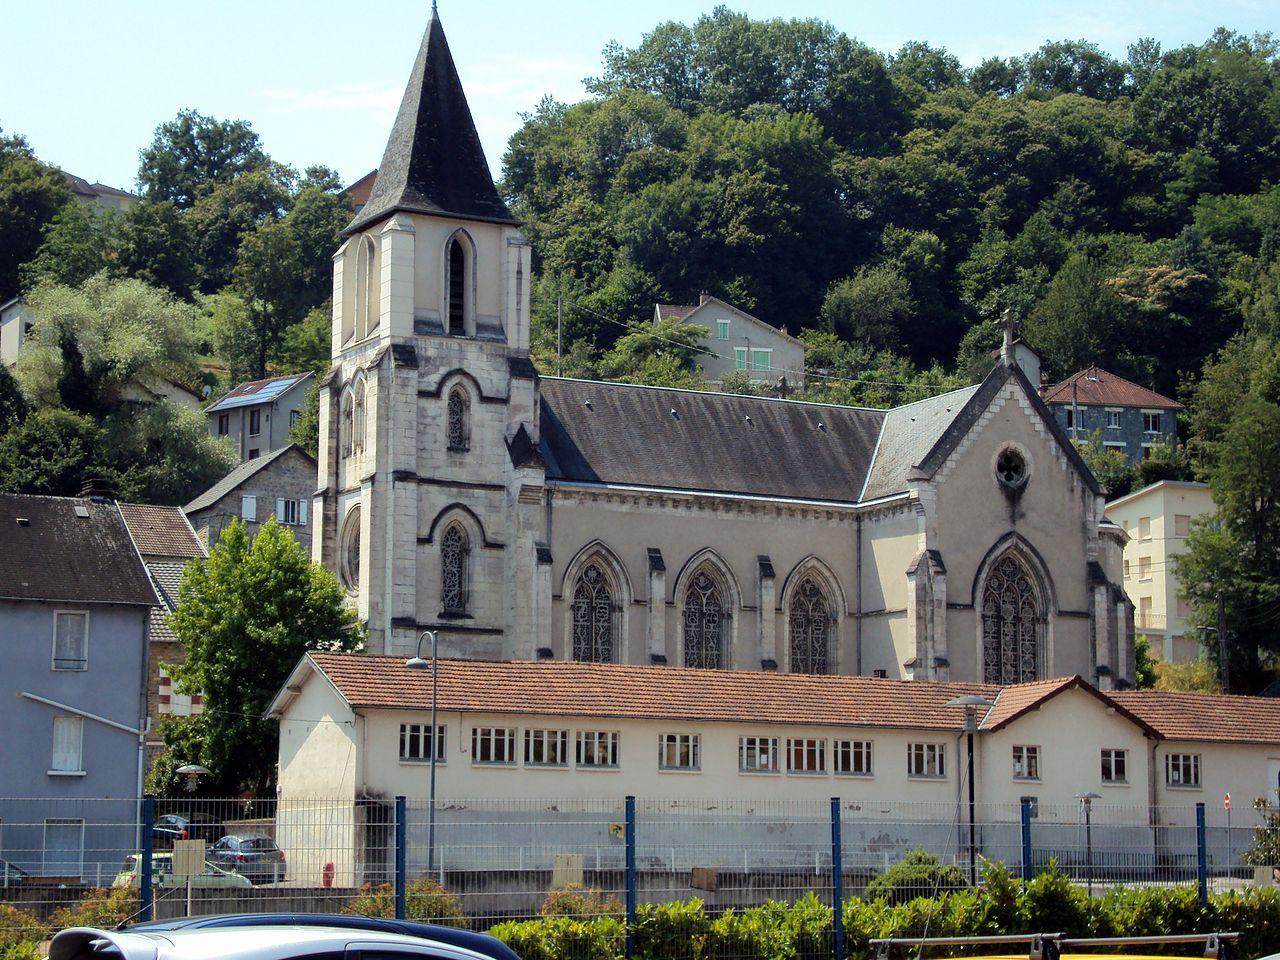 Sainte-Tulle France  City new picture : Original file  3,648 × 2,736 pixels, file size: 4.24 MB, MIME ...